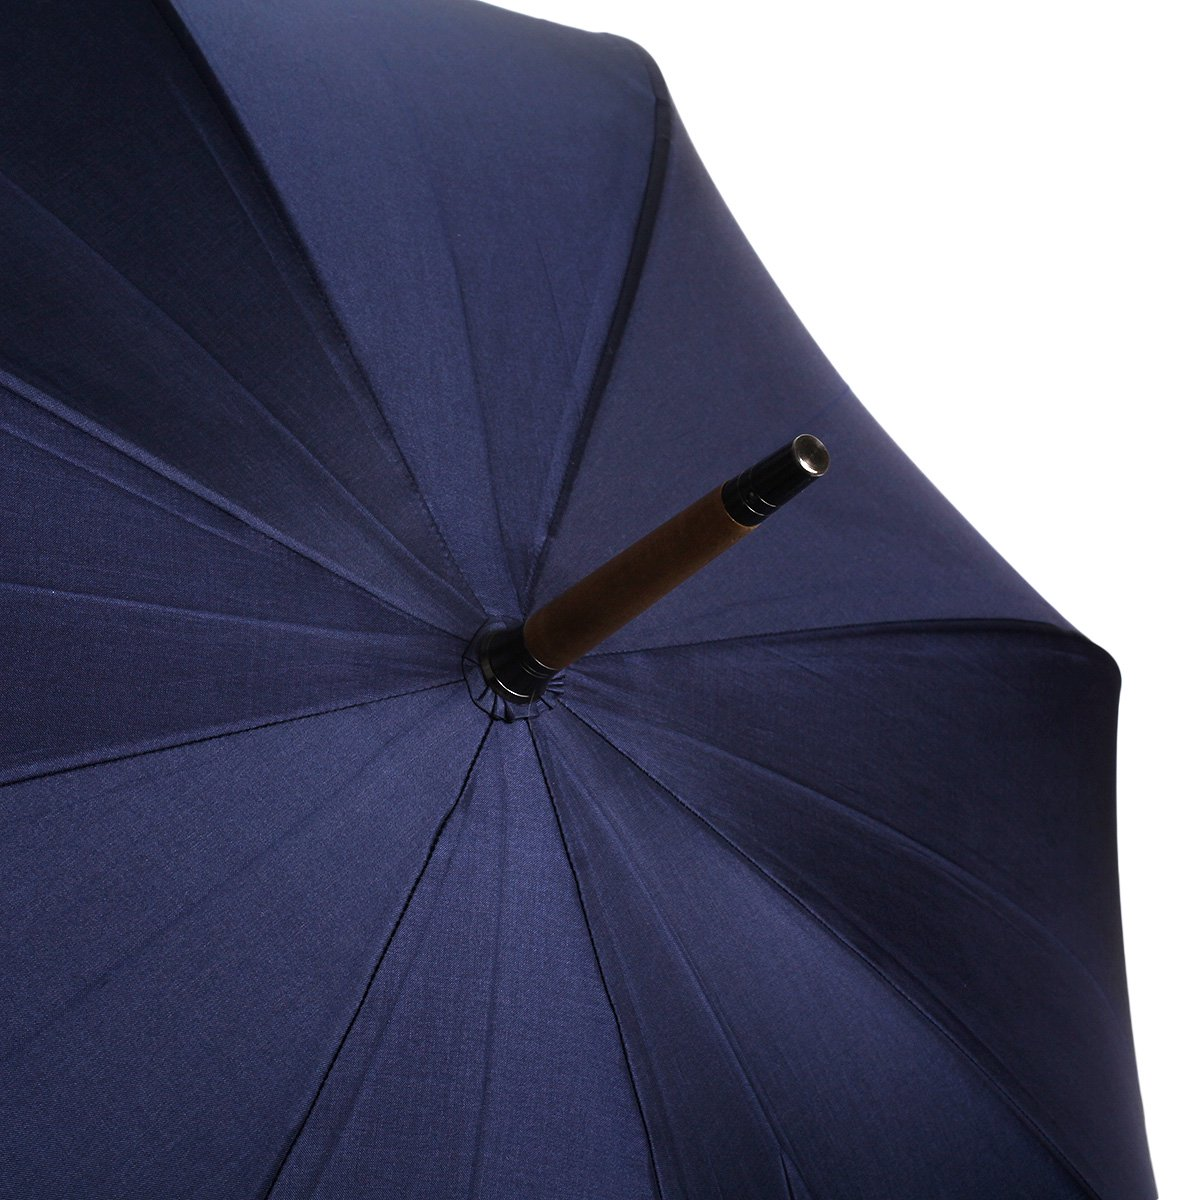 【10%OFF】【公式限定】富士絹 細巻き 長傘(アイアンウッド) 詳細画像10